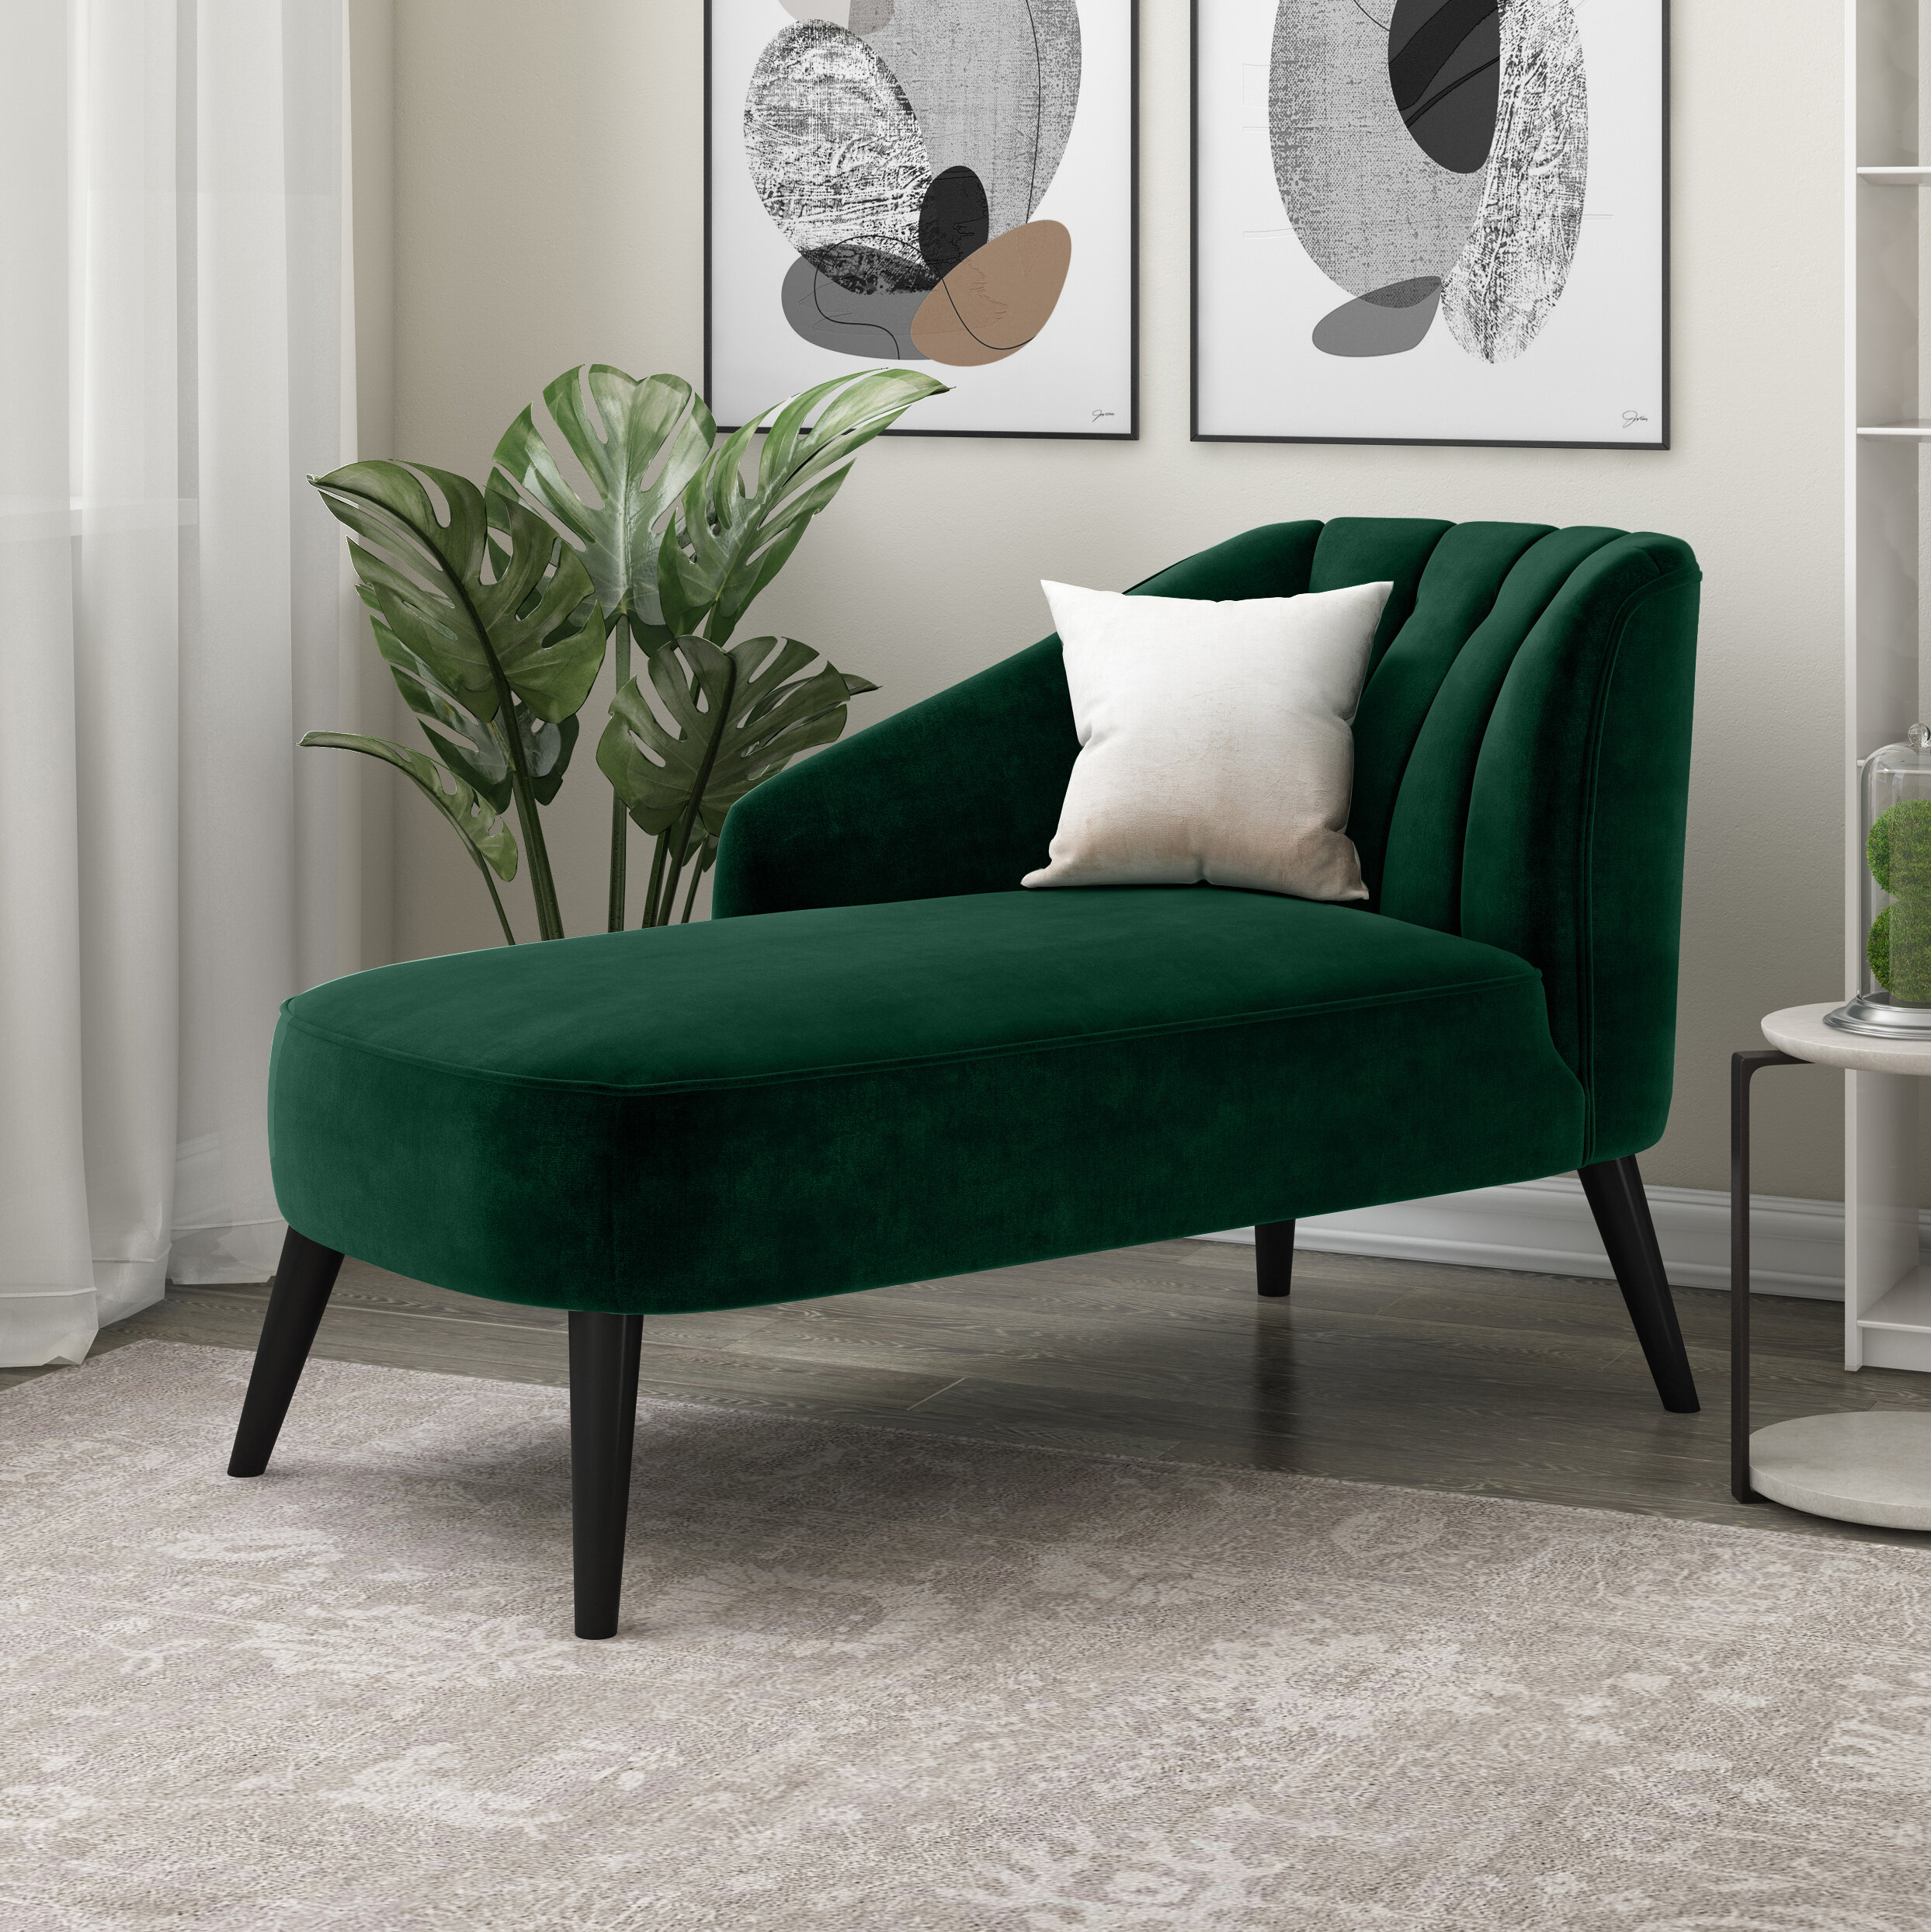 Mercury Row Alaina Tufted Chaise Lounge Reviews Wayfair